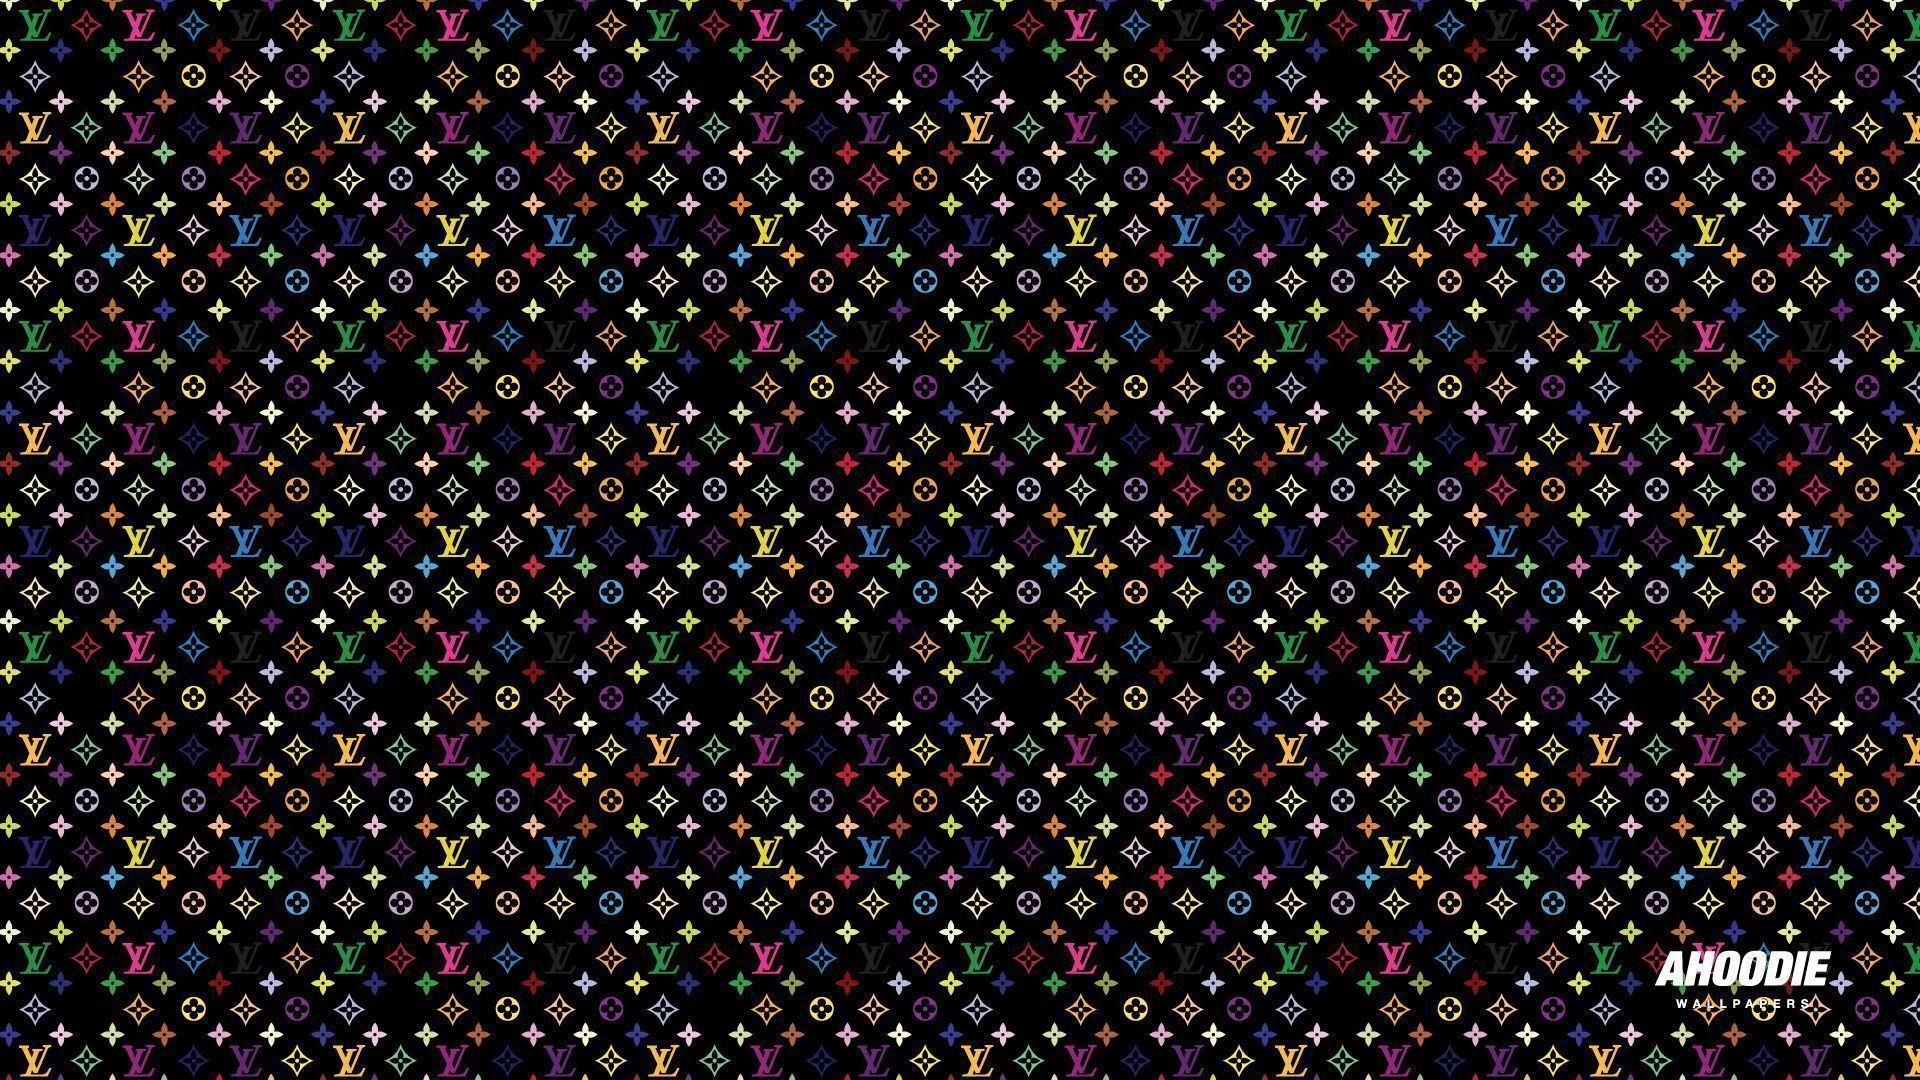 Louis Vuitton Desktop Wallpapers AHOODIE 1920x1080